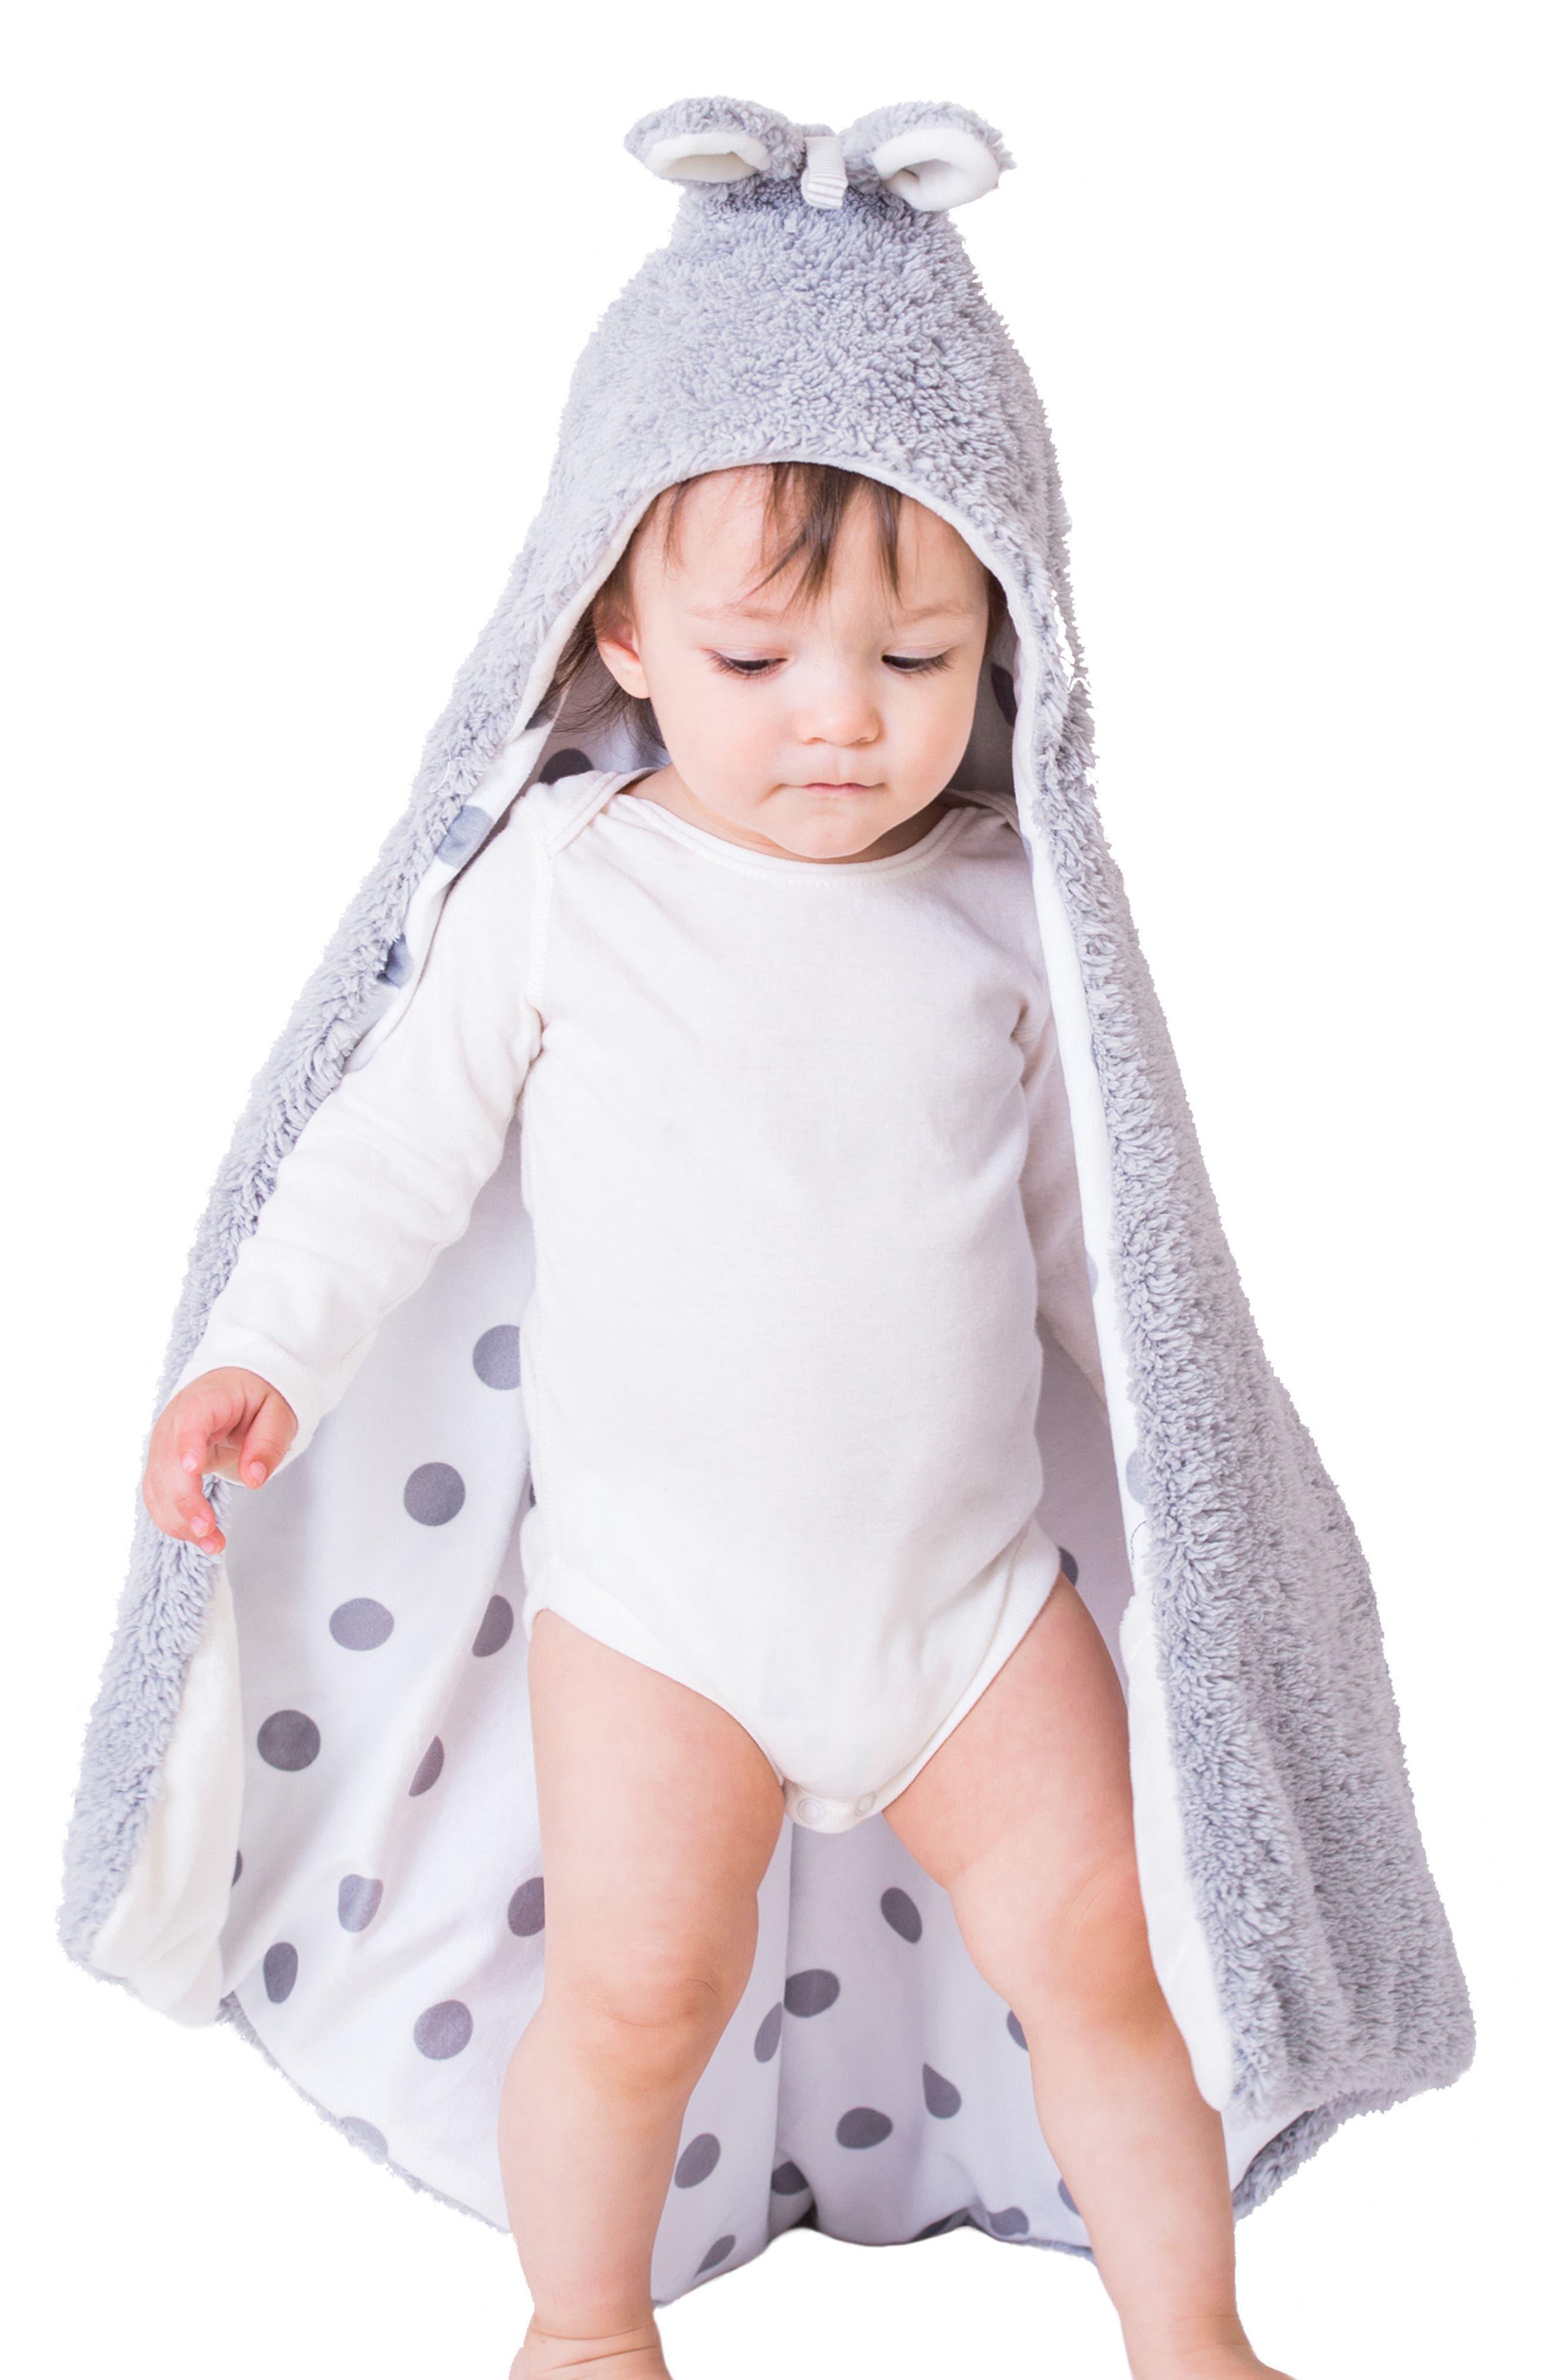 Storytime Hooded Blanket, Stuffed Animal & Book Set,                             Alternate thumbnail 2, color,